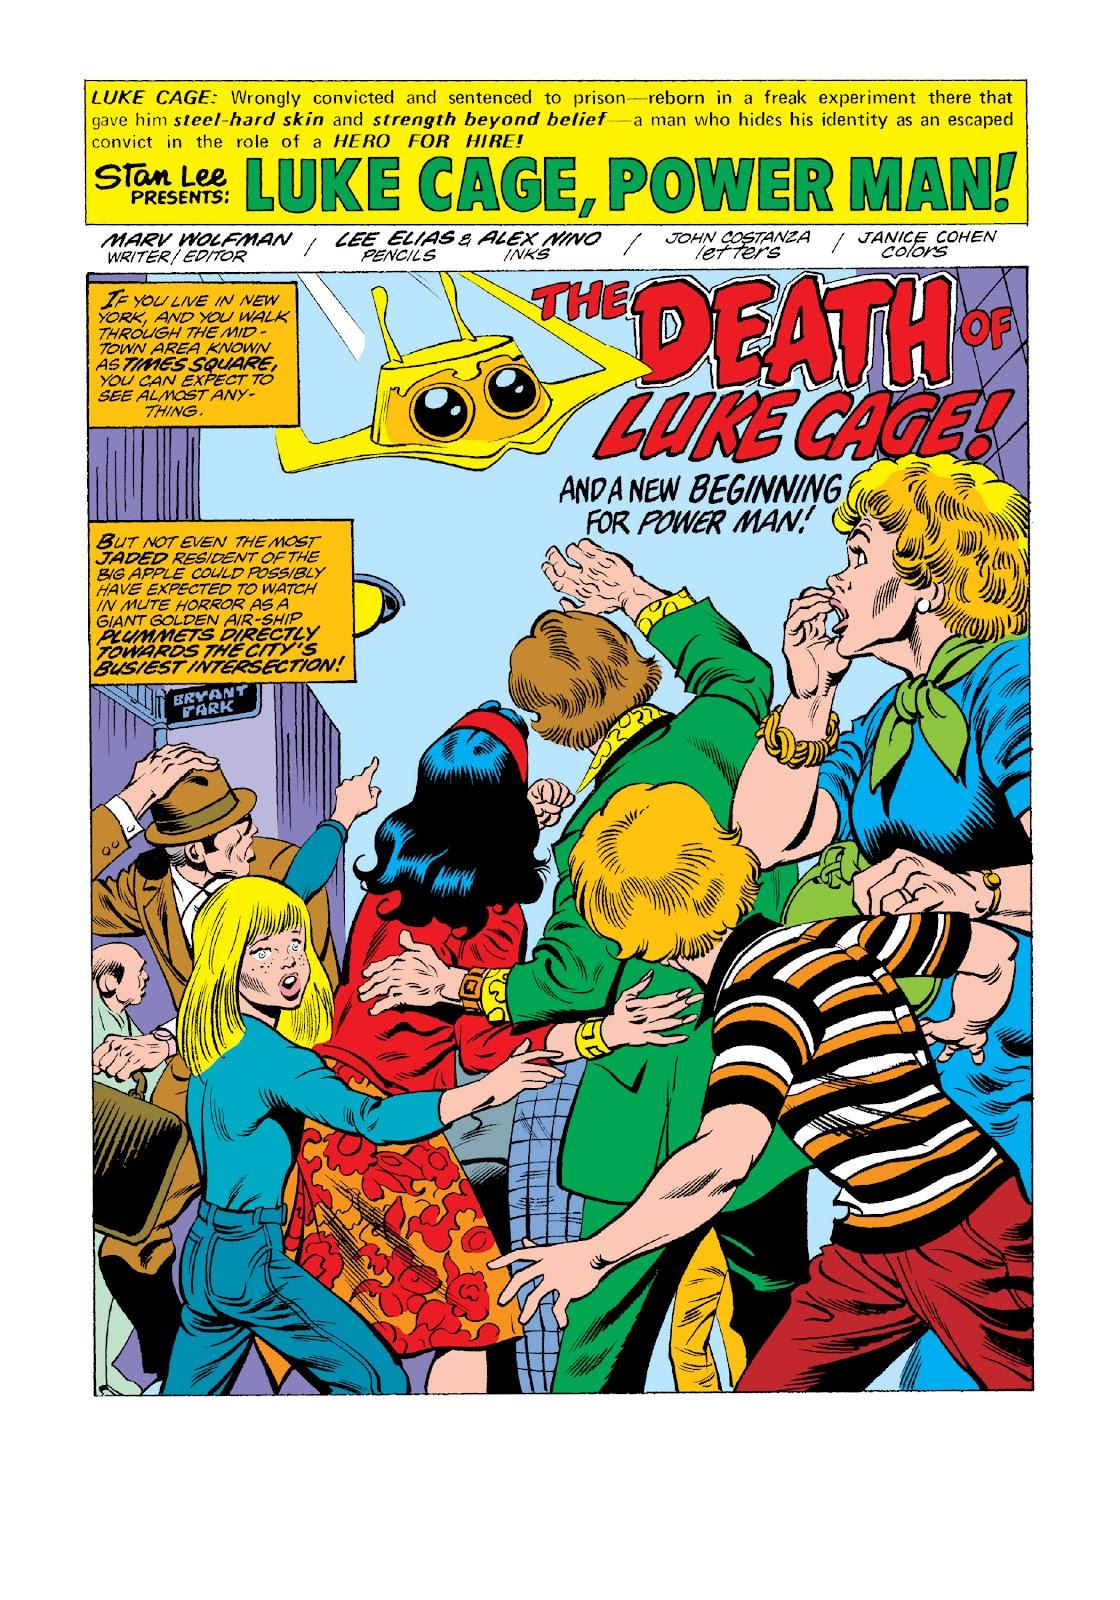 Read online Marvel Masterworks: Luke Cage, Power Man comic -  Issue # TPB 3 (Part 3) - 28